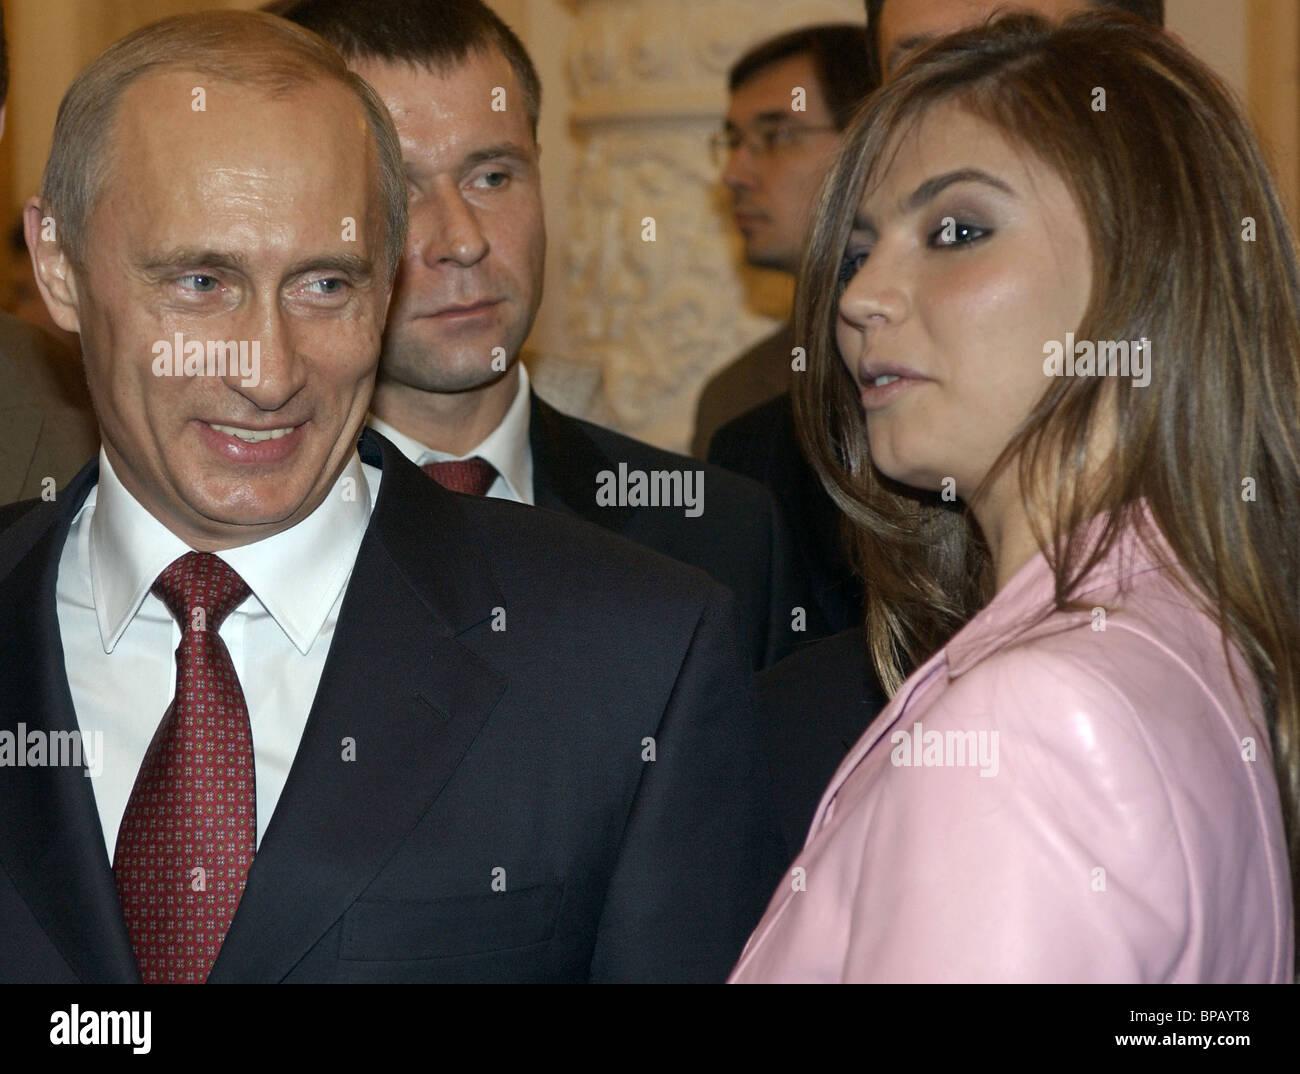 Russian President Vladimir Putin met with members of the RF Olympic team - Stock Image